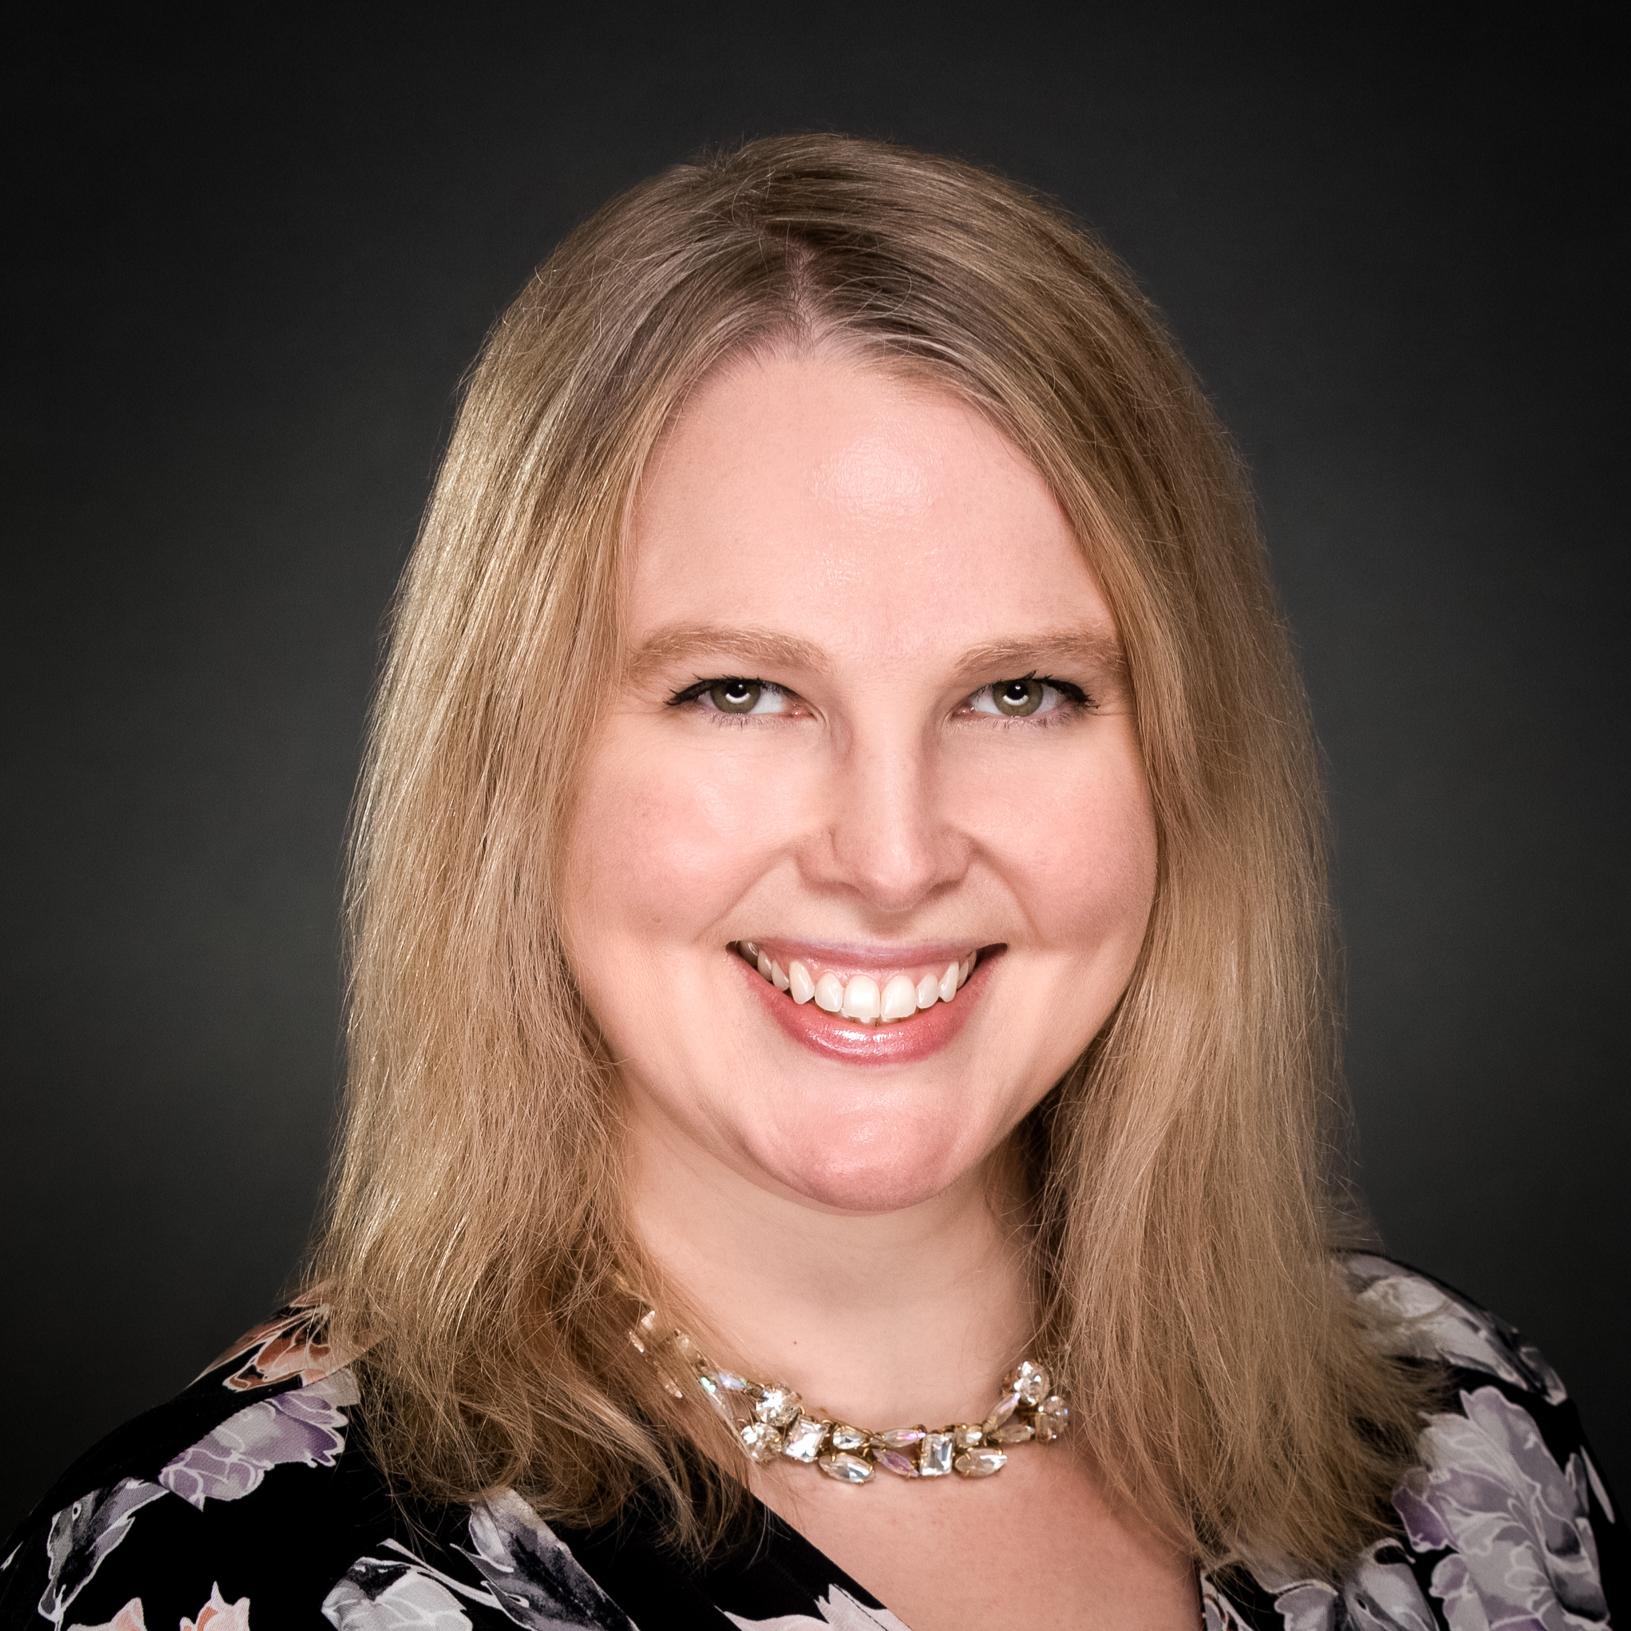 SHAWNA MILLER - Vice President, Head of Marketing & Communications, Canada,  Mastercard